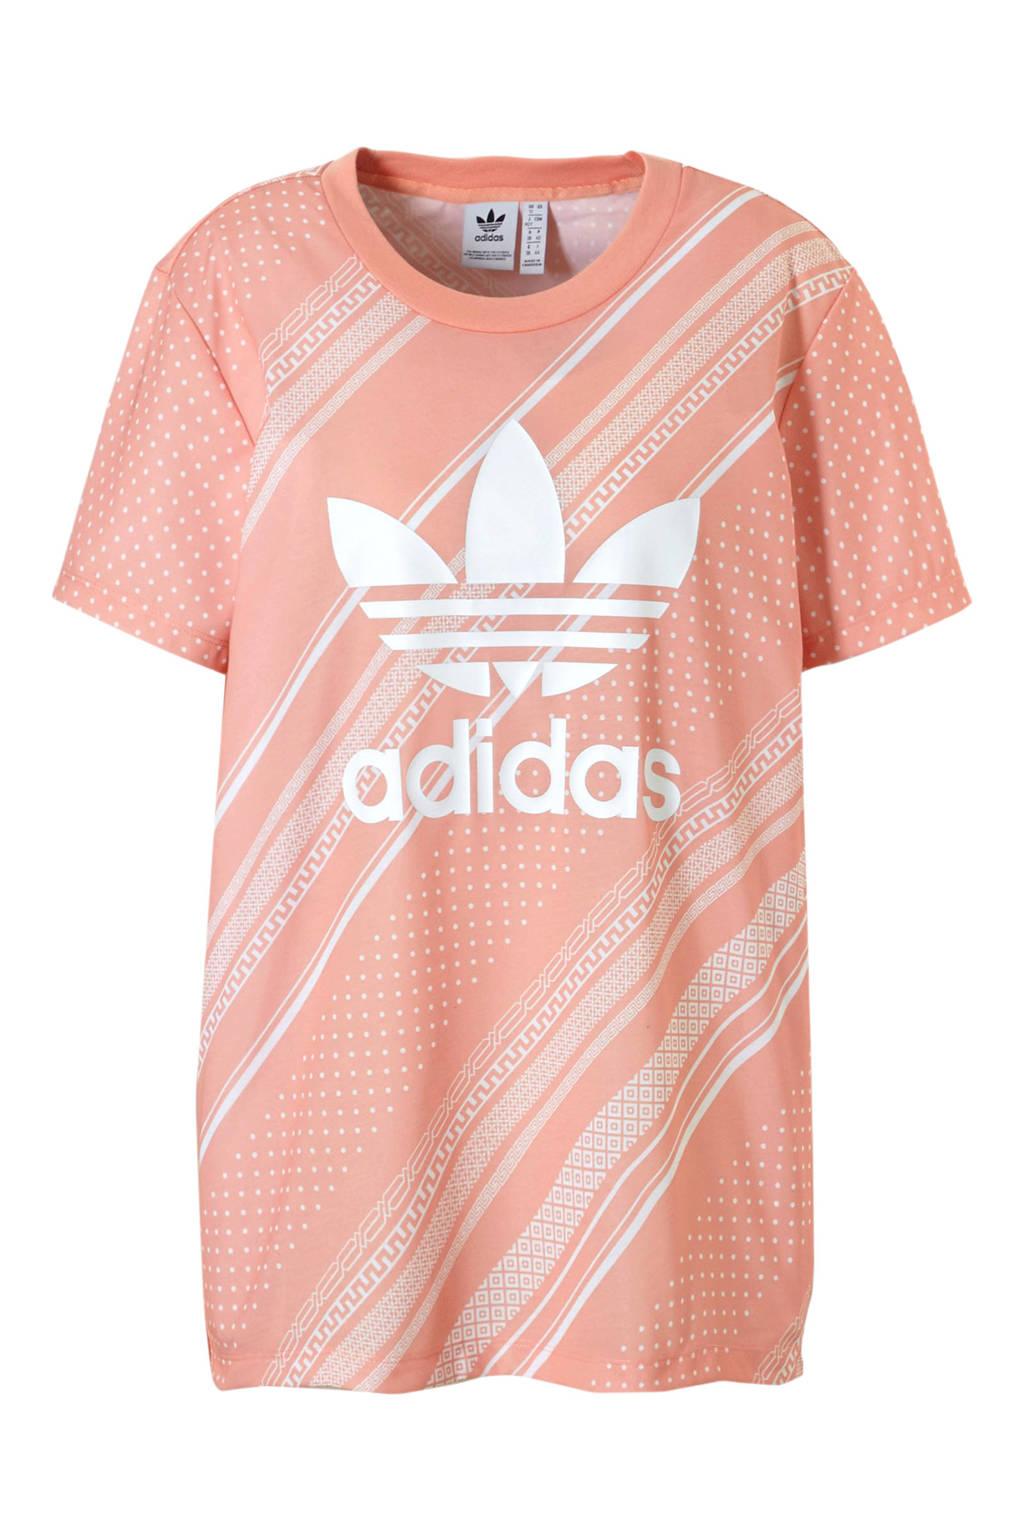 adidas originals T-shirt met all over print zalmroze/wit